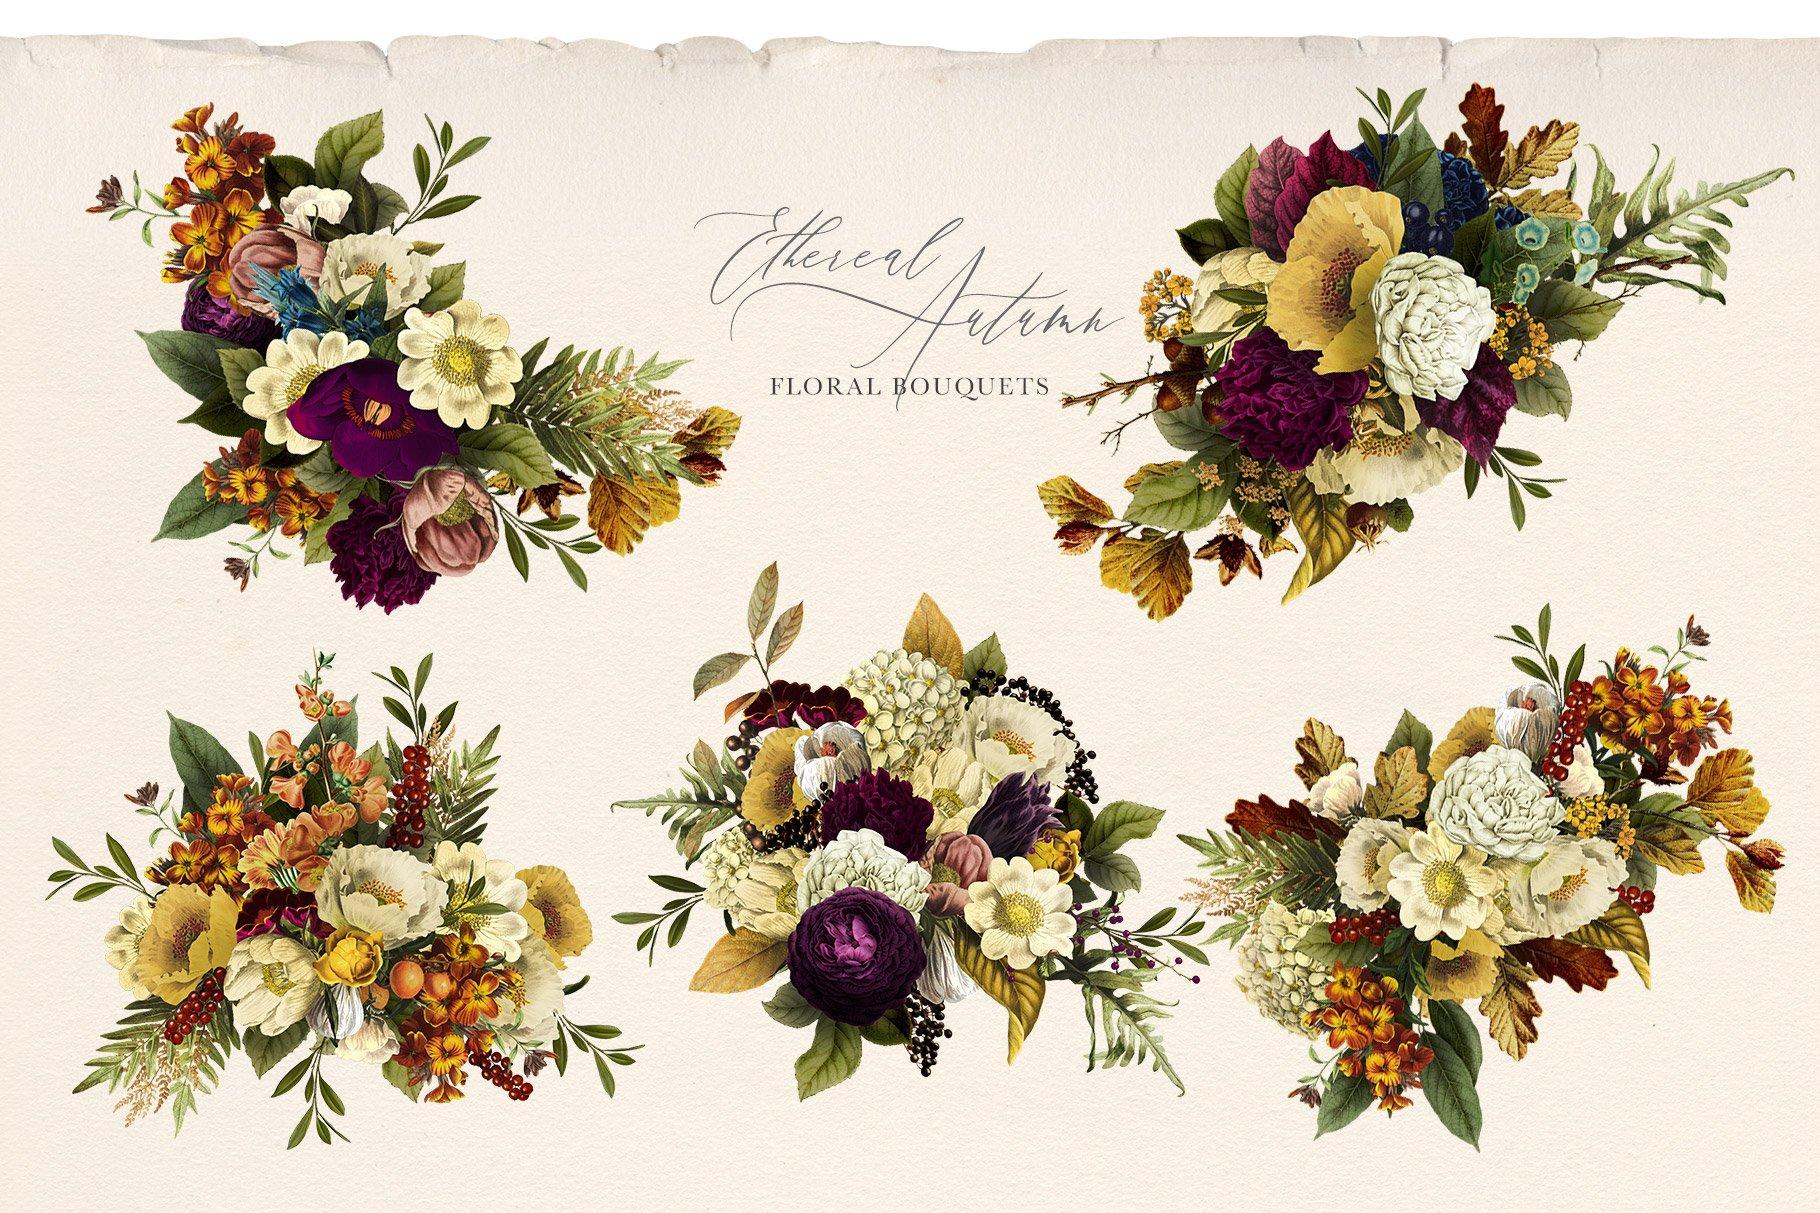 35款高清复古植物花卉平面广告背景设计PNG免抠图片素材 Ethereal Autumn Floral Bouquets插图(3)